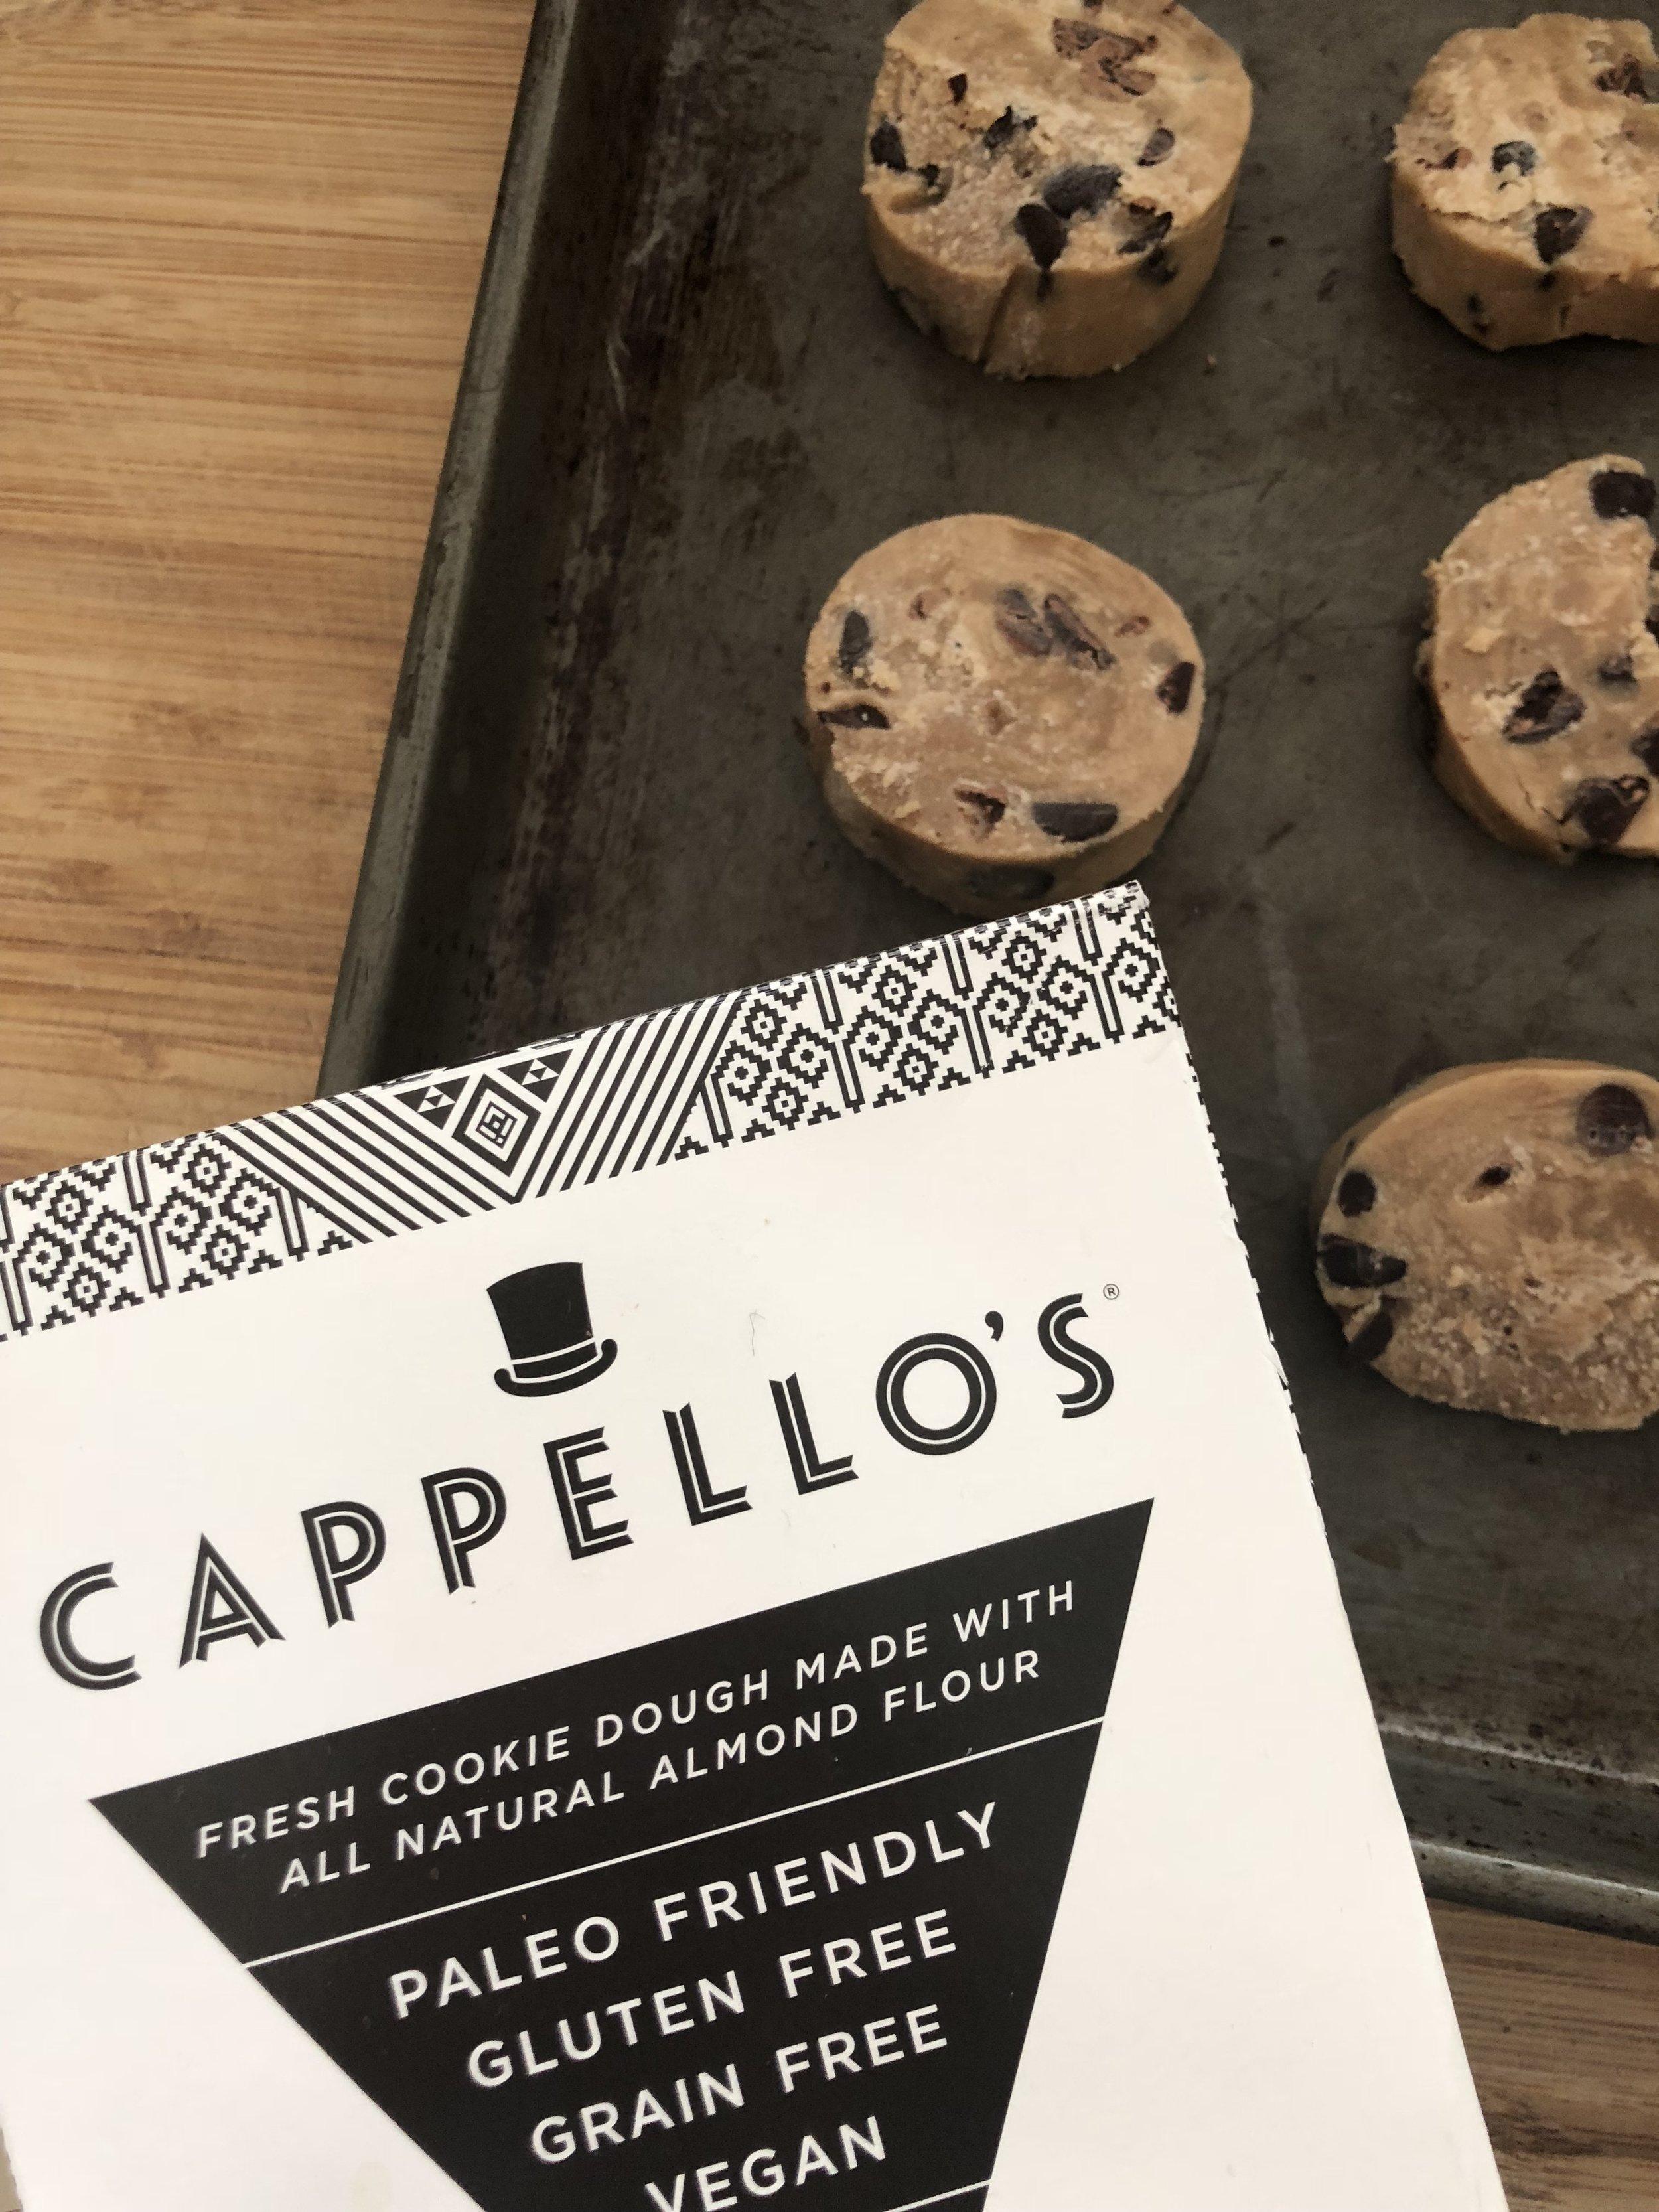 Cappello's delicious cookies!